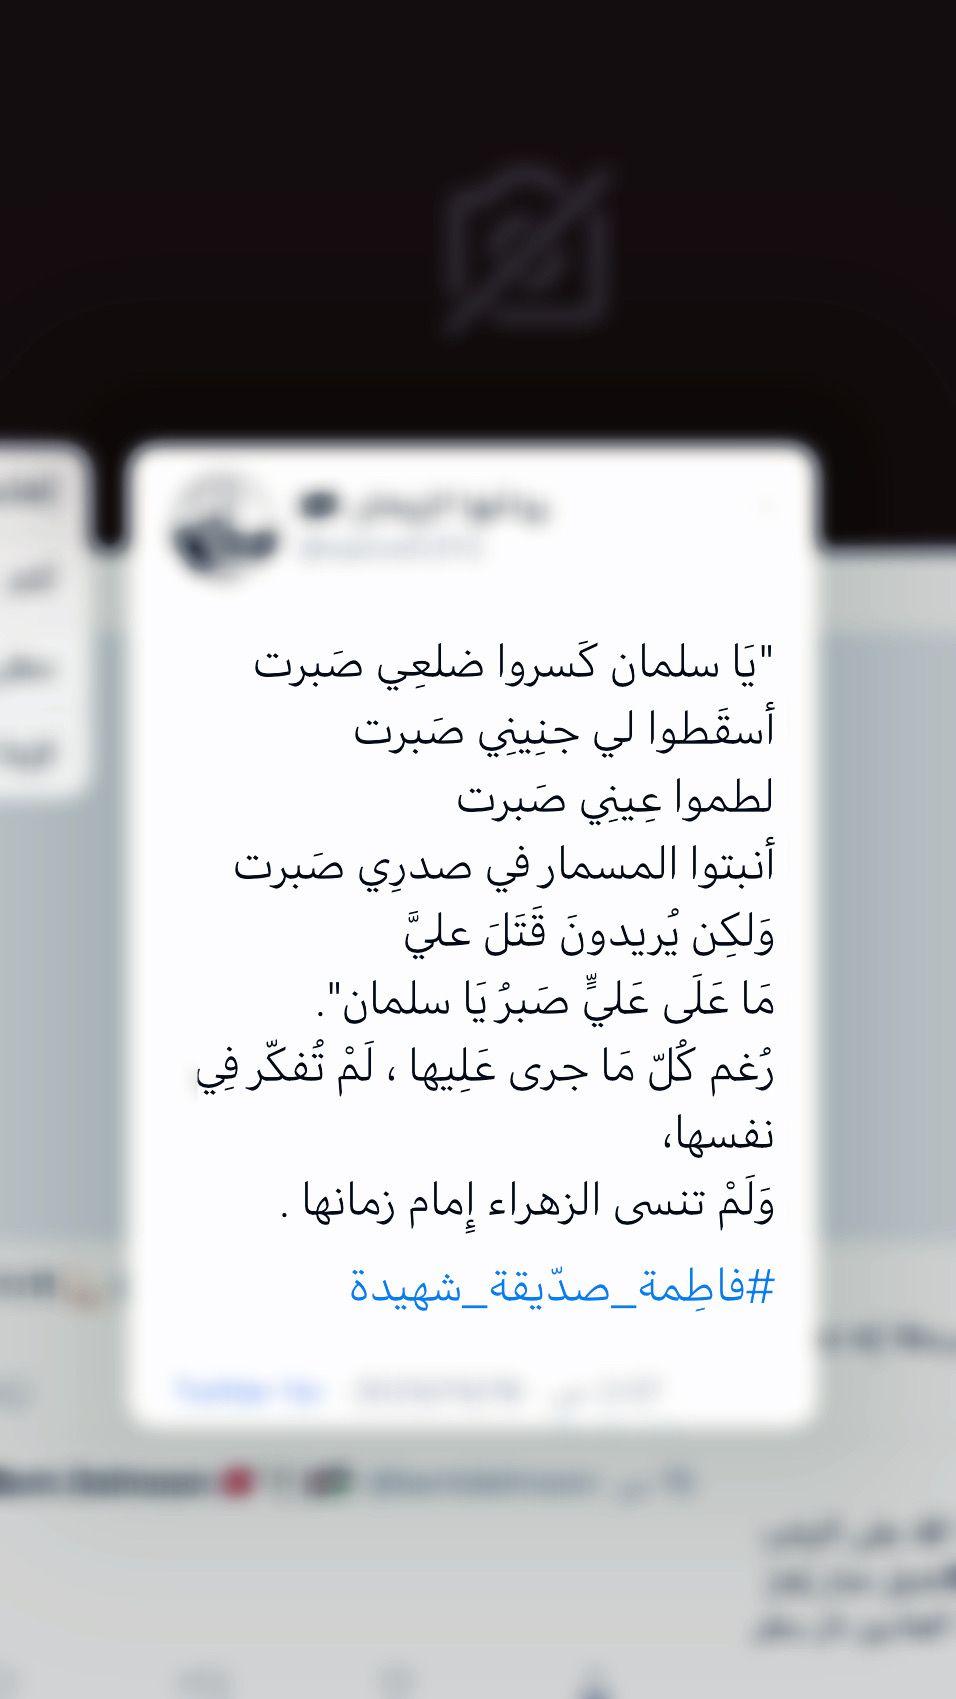 Pin By ت ـسنـيم ʚĭɞ On فاط مة سلام الله عليها Beautiful Arabic Words Phone Wallpaper Design Words